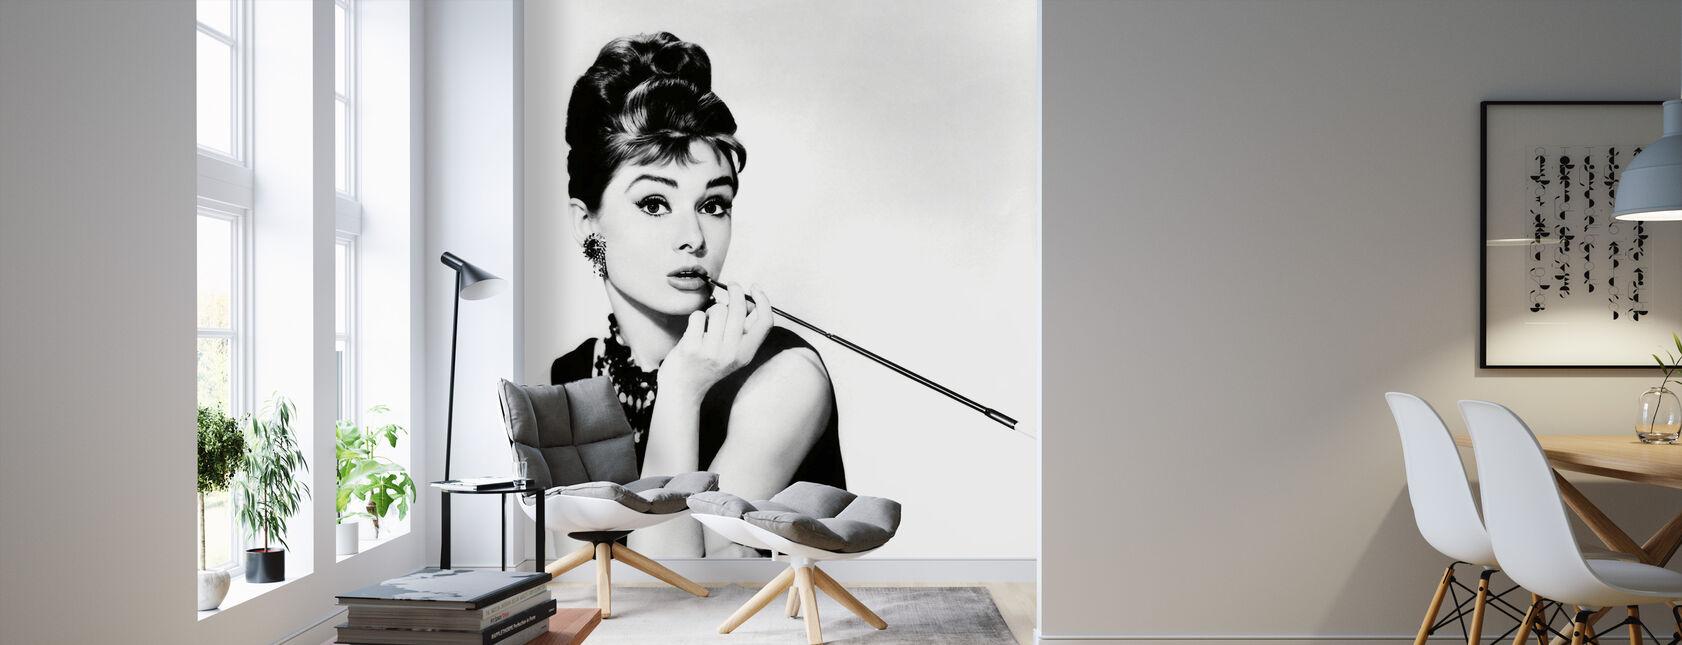 Audrey Hepburn in Breakfast at Tiffanys - Wallpaper - Living Room